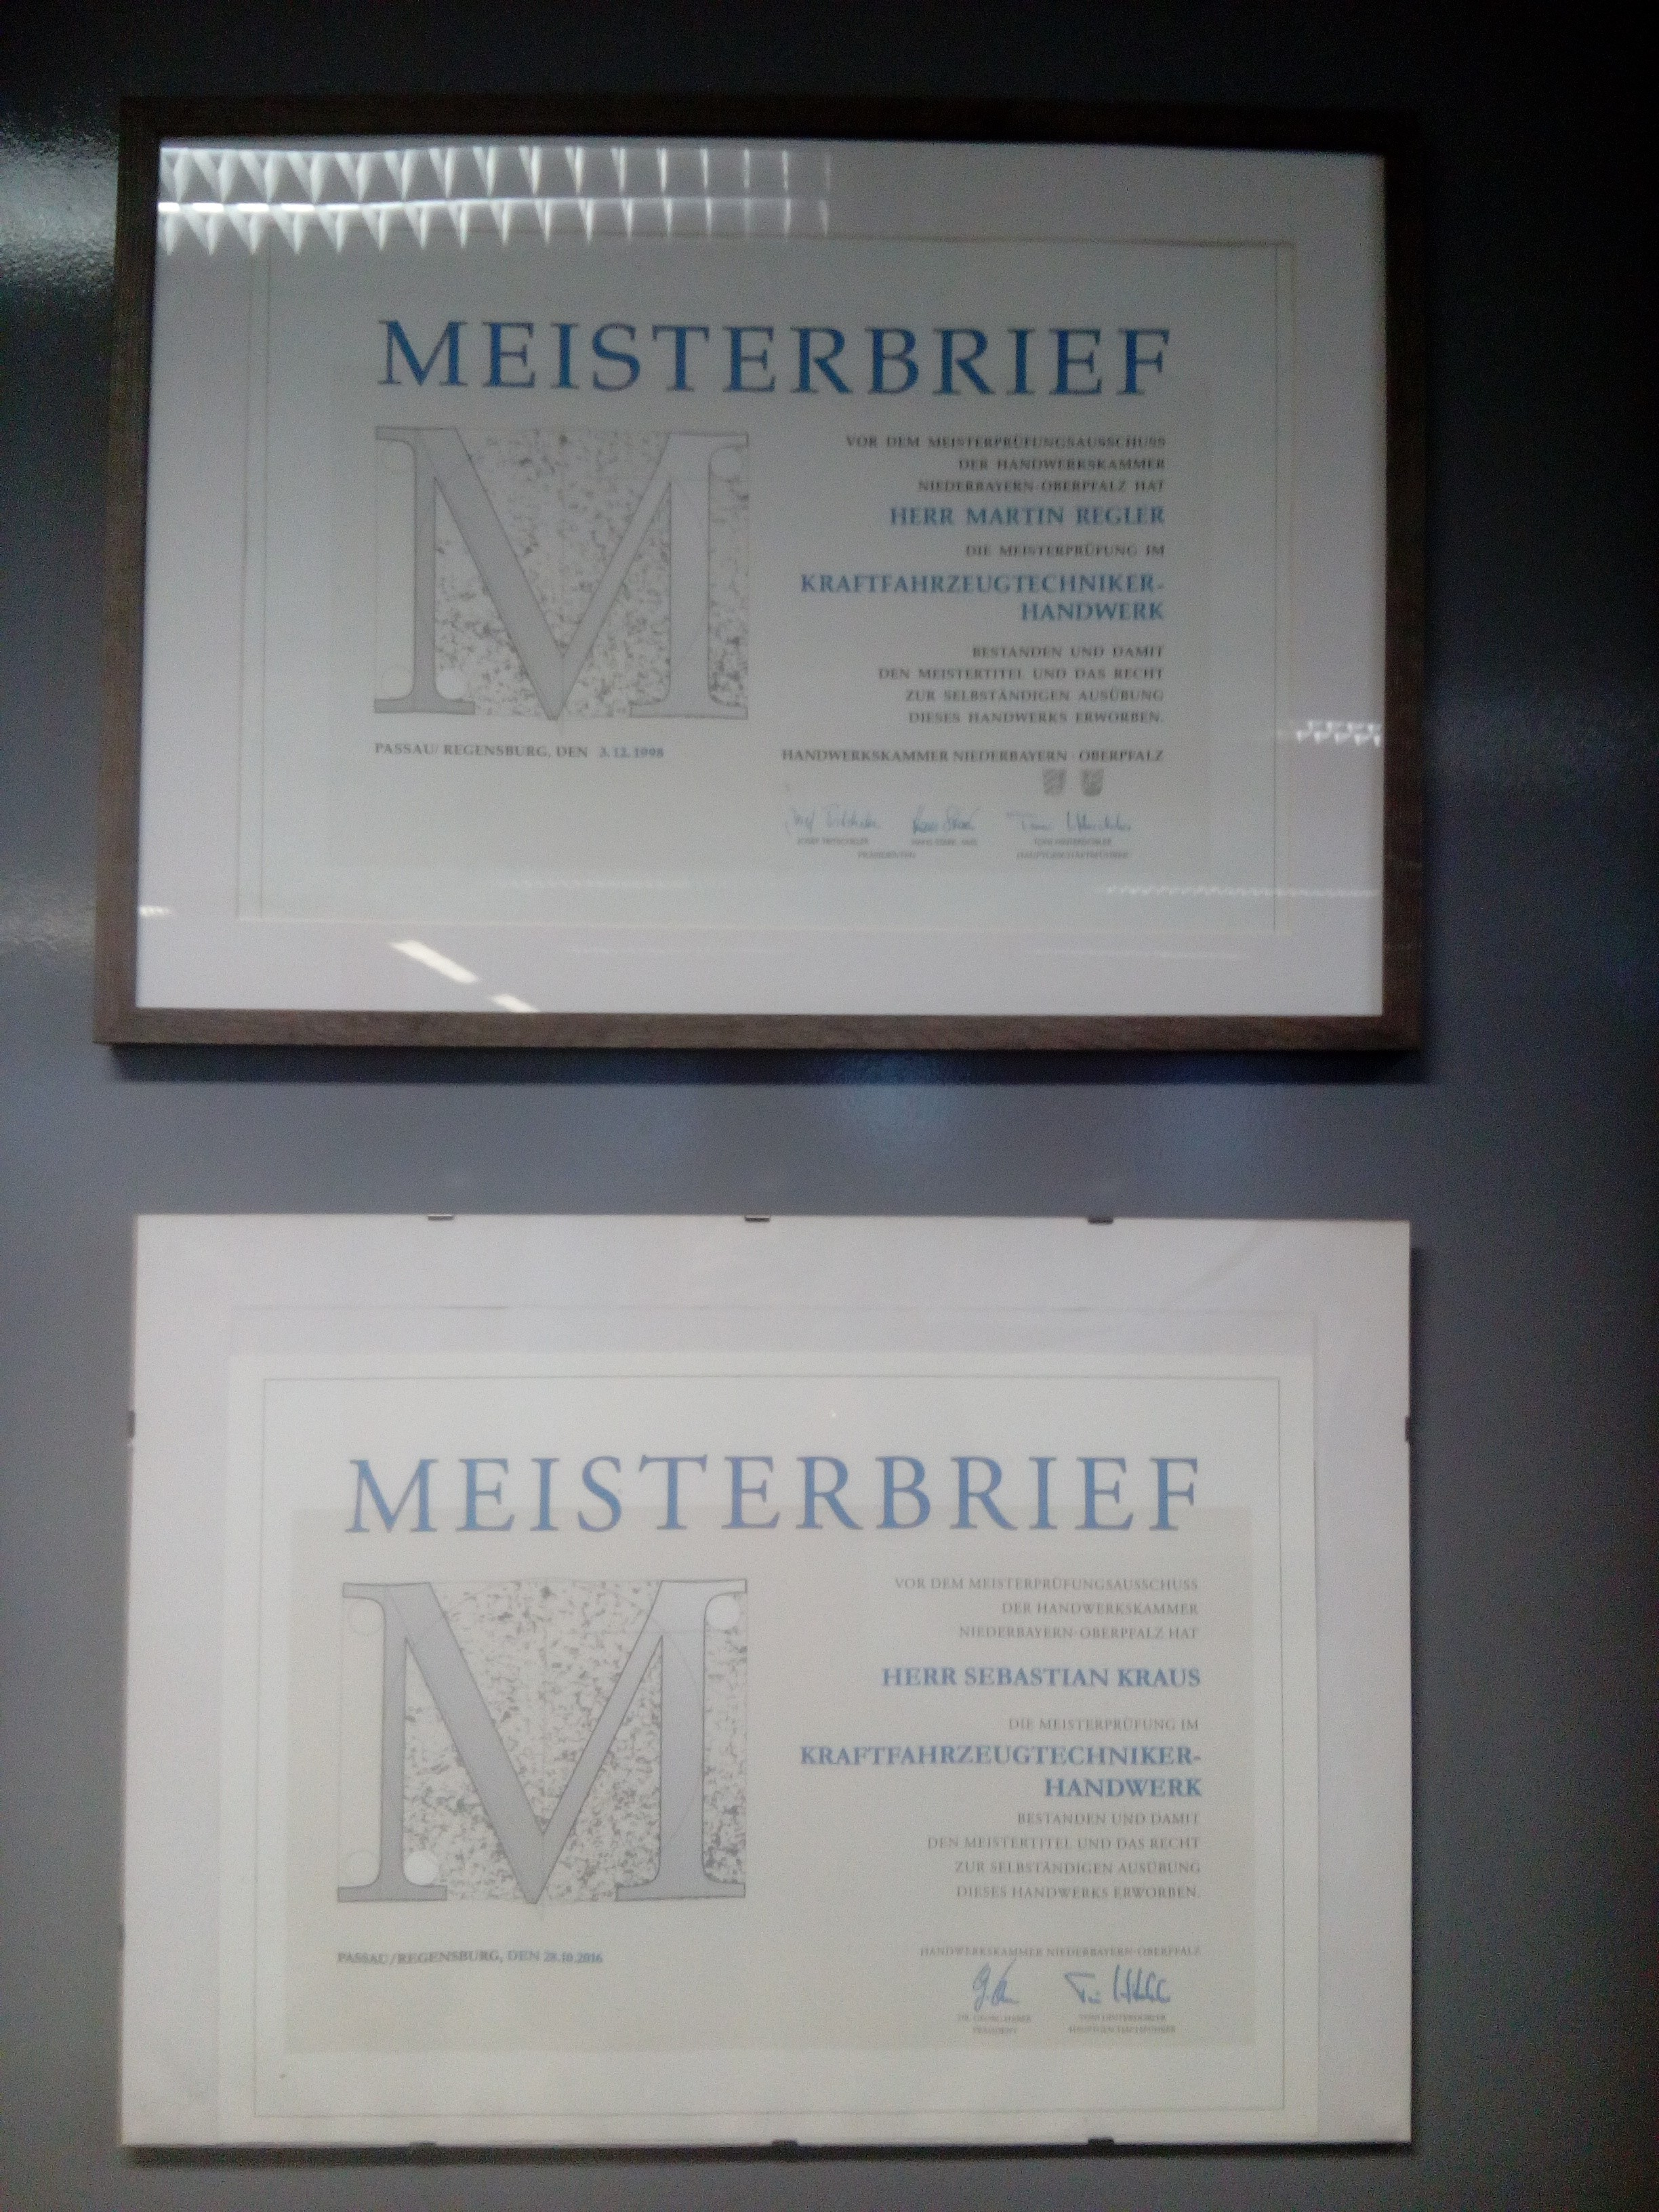 Kfz-Meisterwerkstatt Martin Regler GmbH